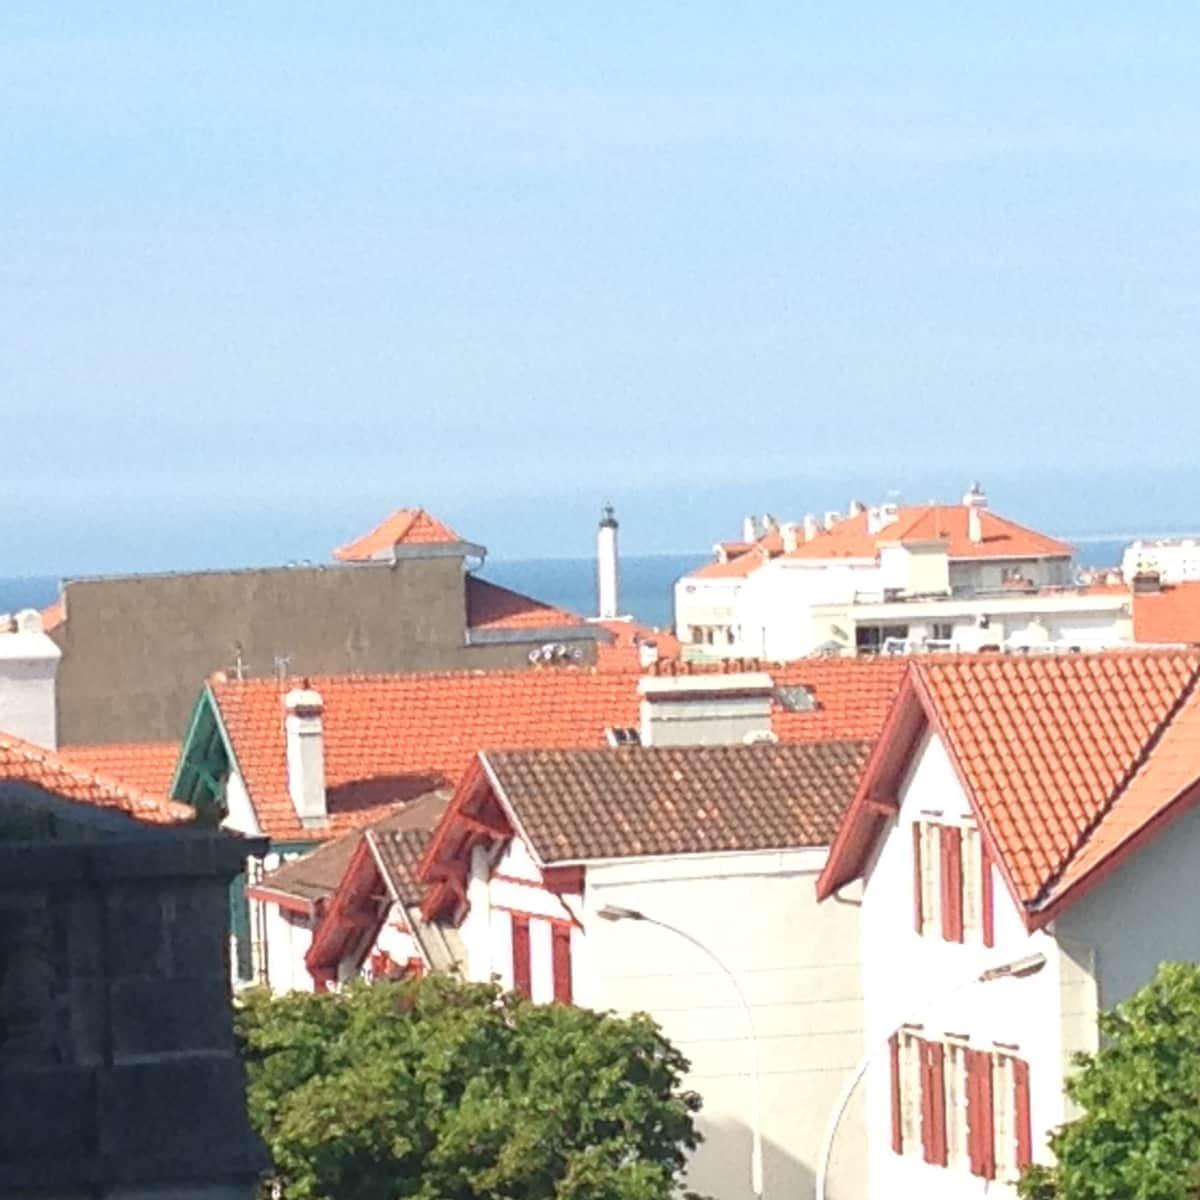 Ferienwohnung in Biarritz Atlantik